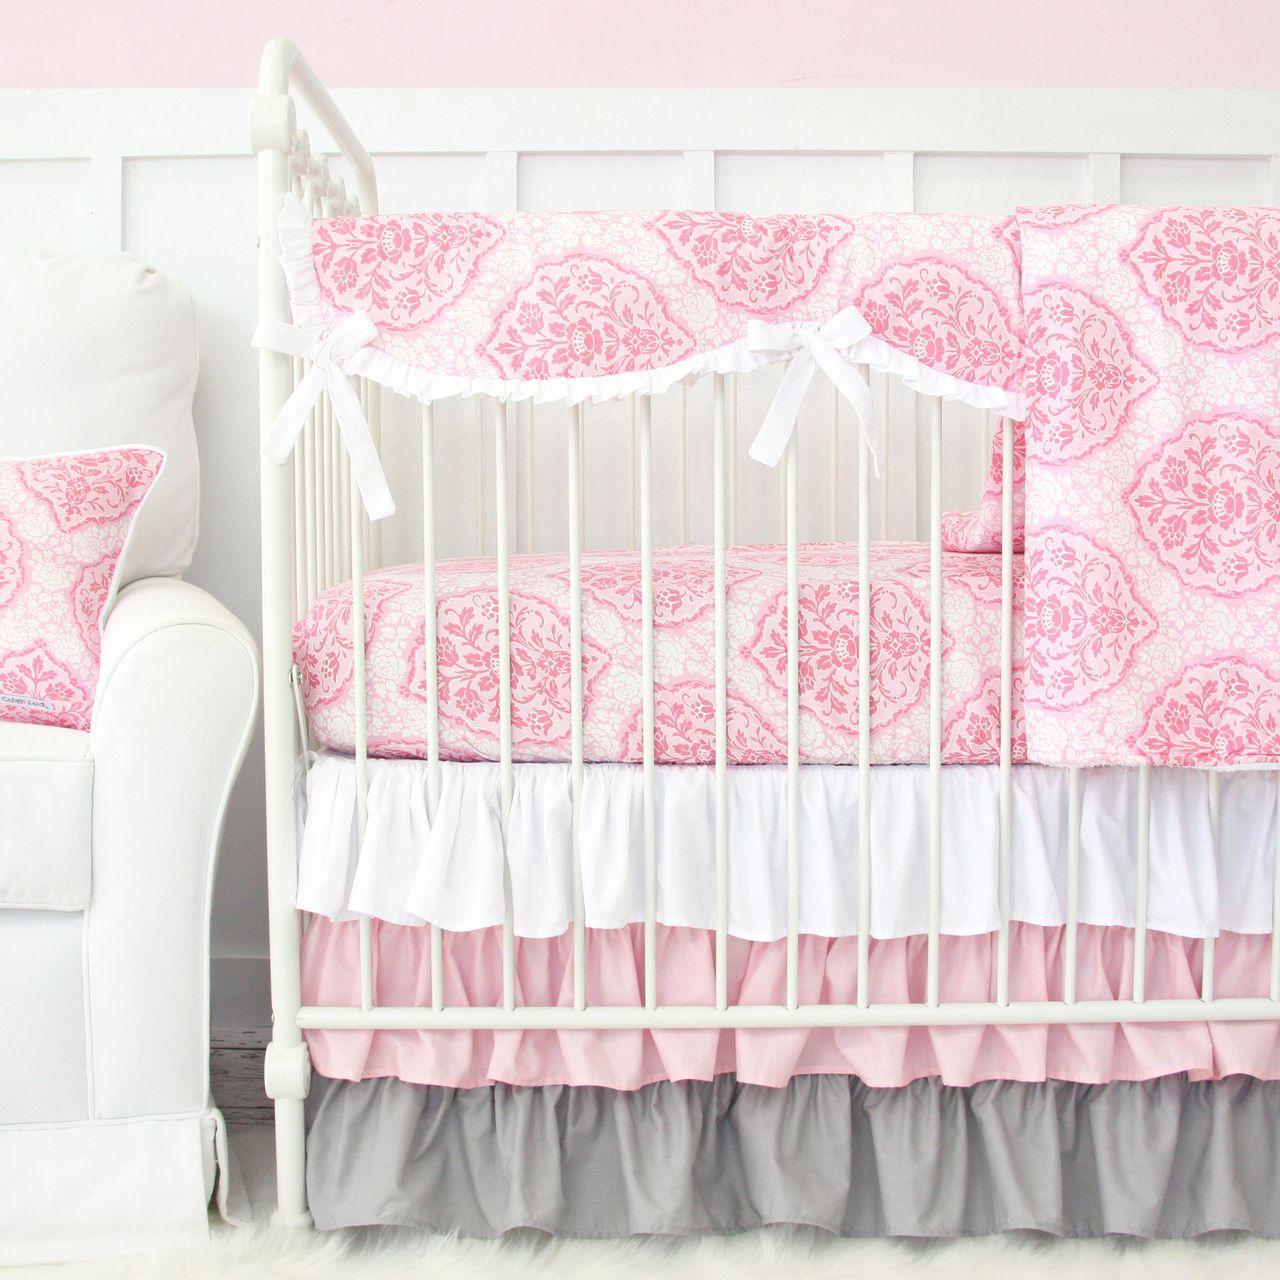 A Classic Pink Gray Crib Bedding Set That S Perfectly Elegant